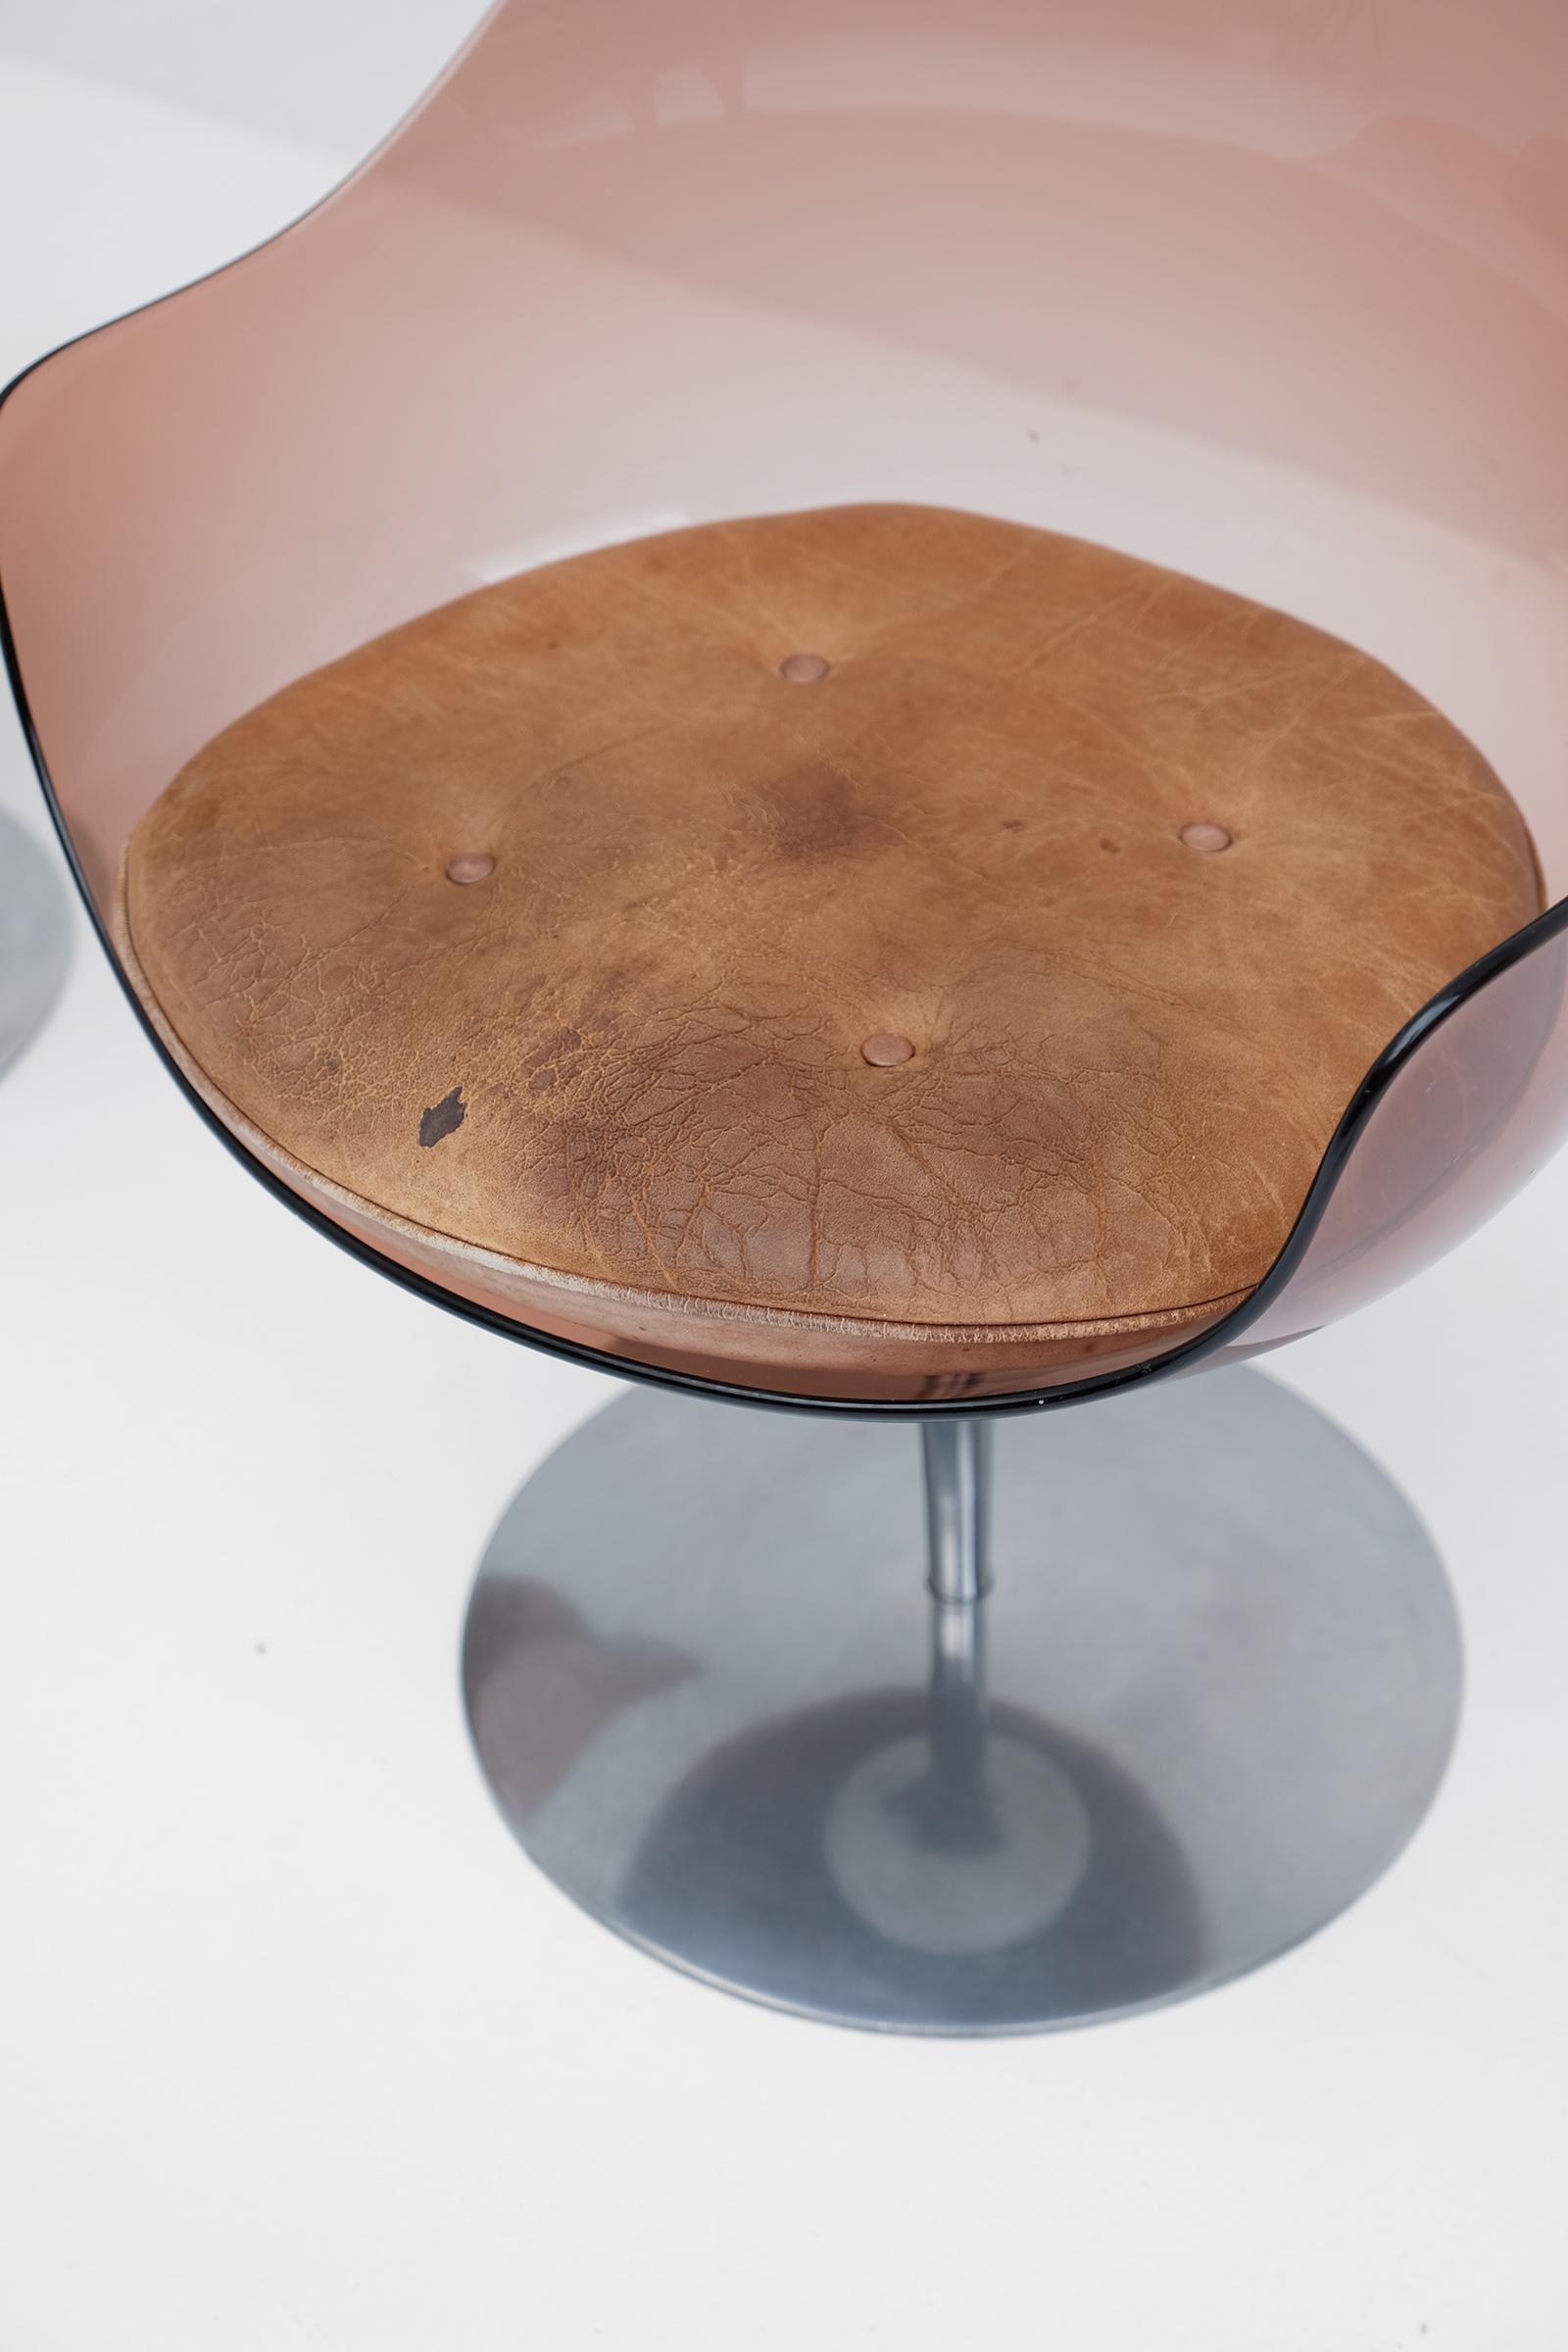 Laverne Champagne Chairs Formes Nouvellesimage 5